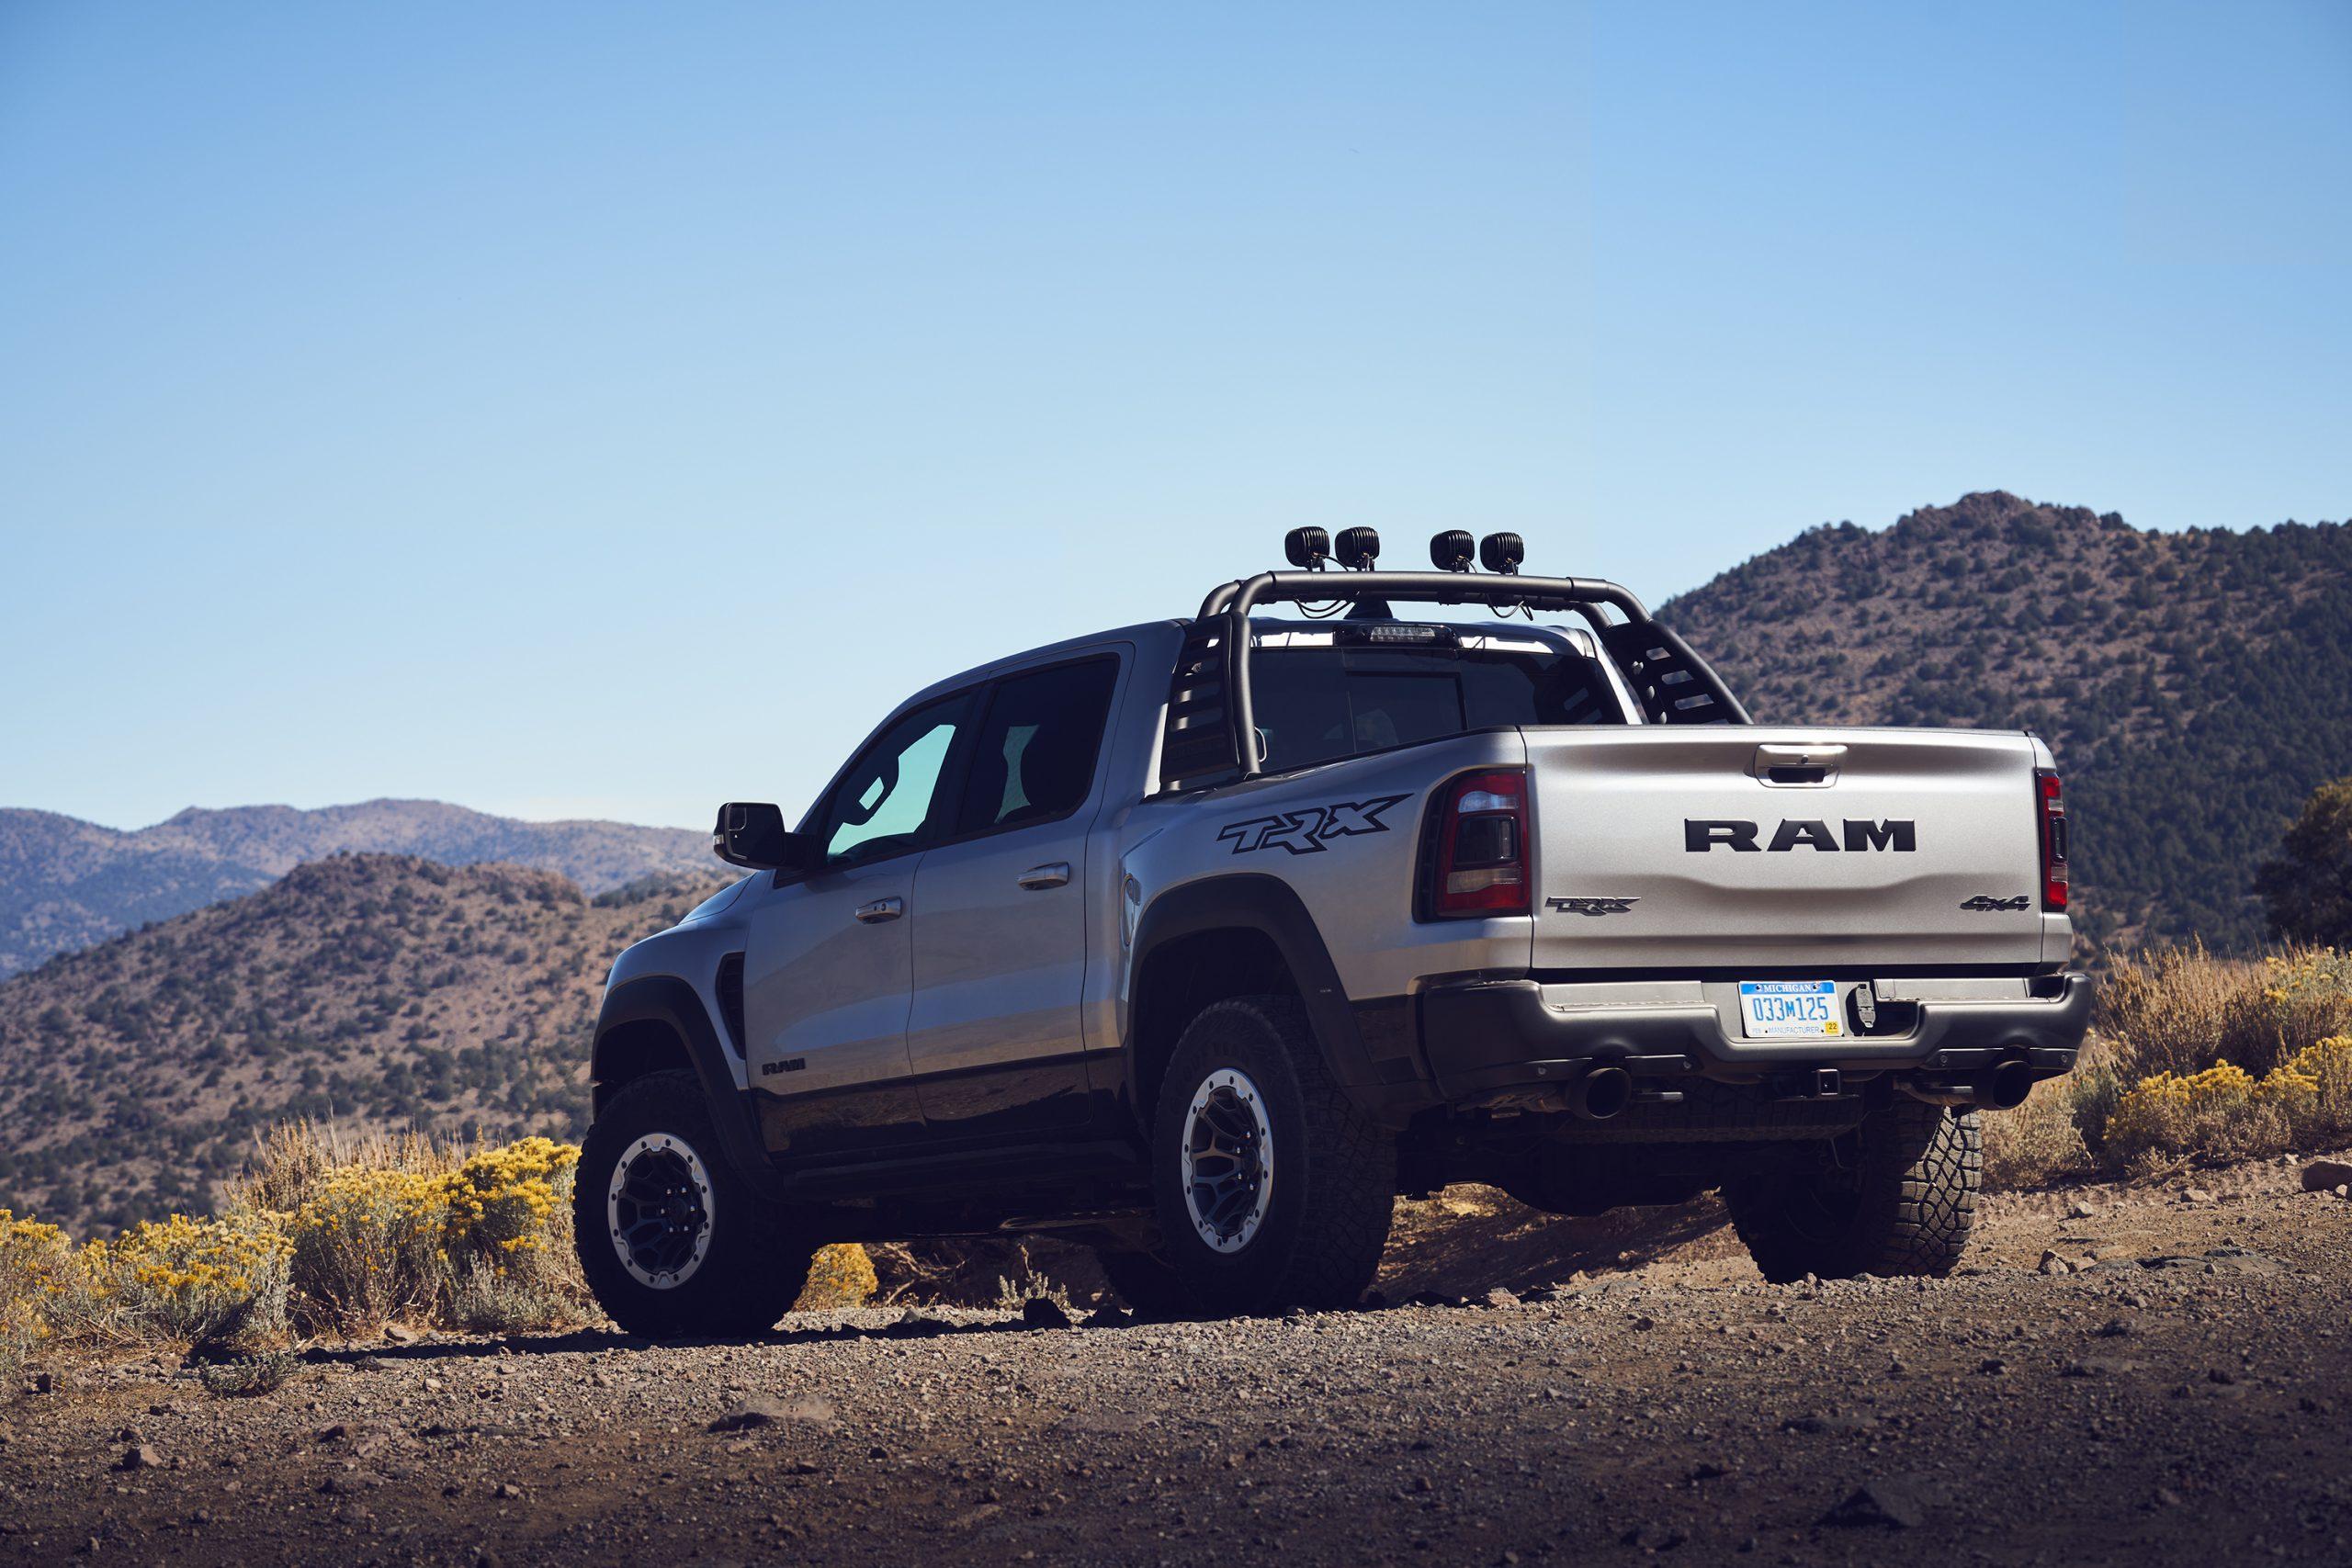 2021 Ram 1500 TRX rear three-quarter close